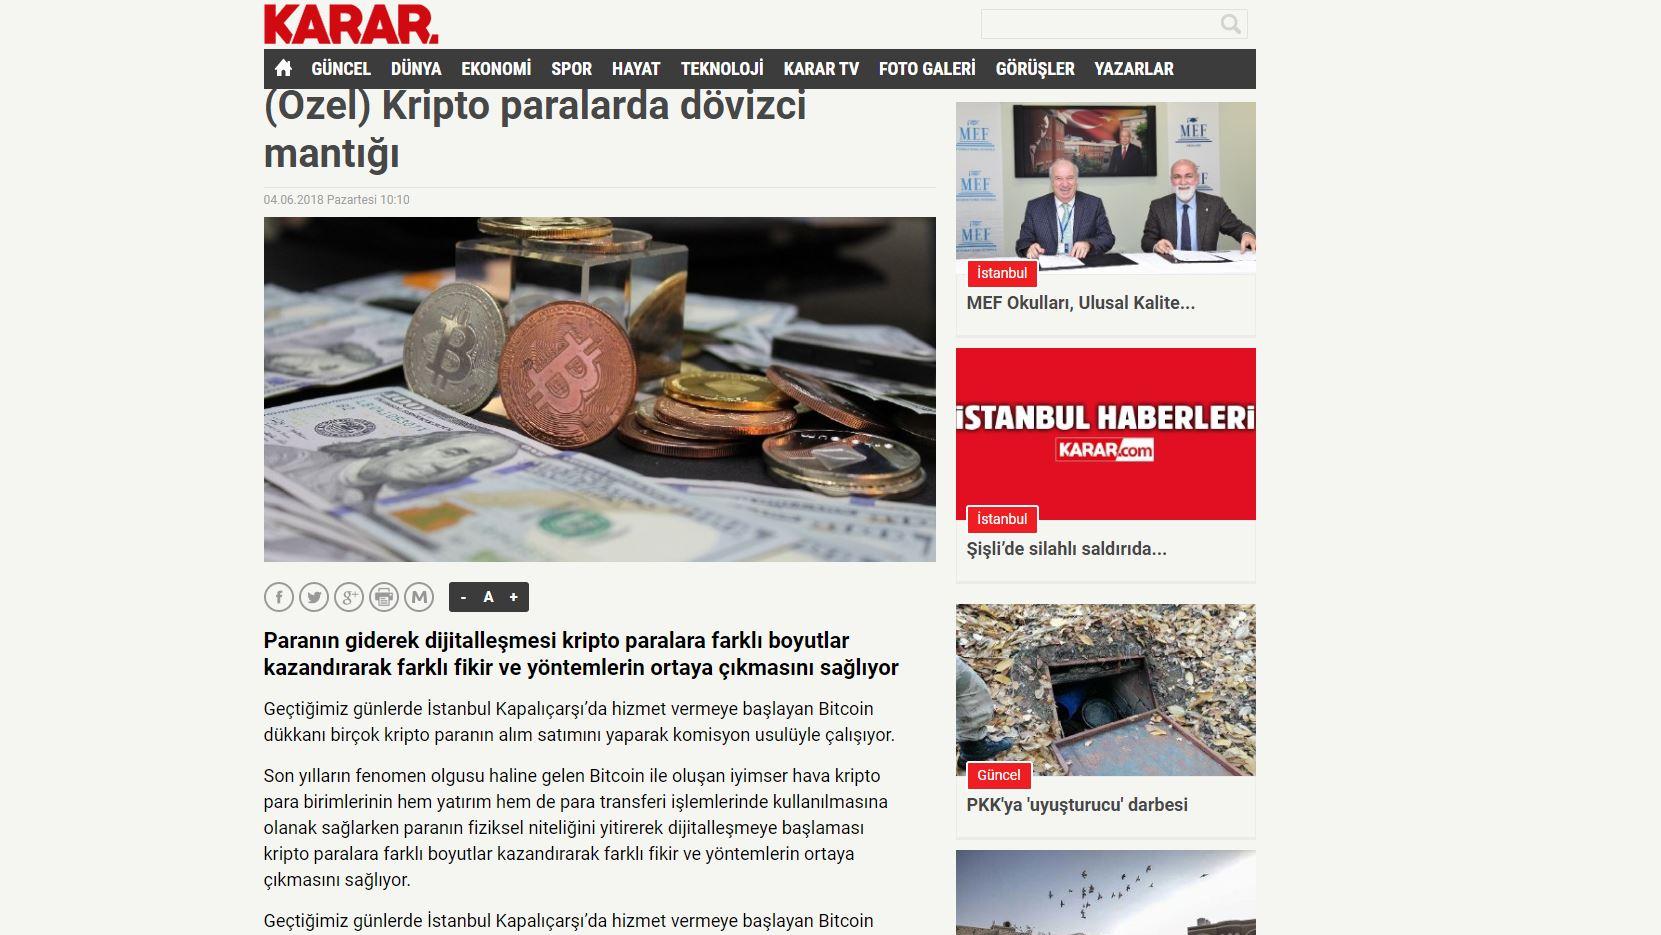 Karar.com Cointral Haberi